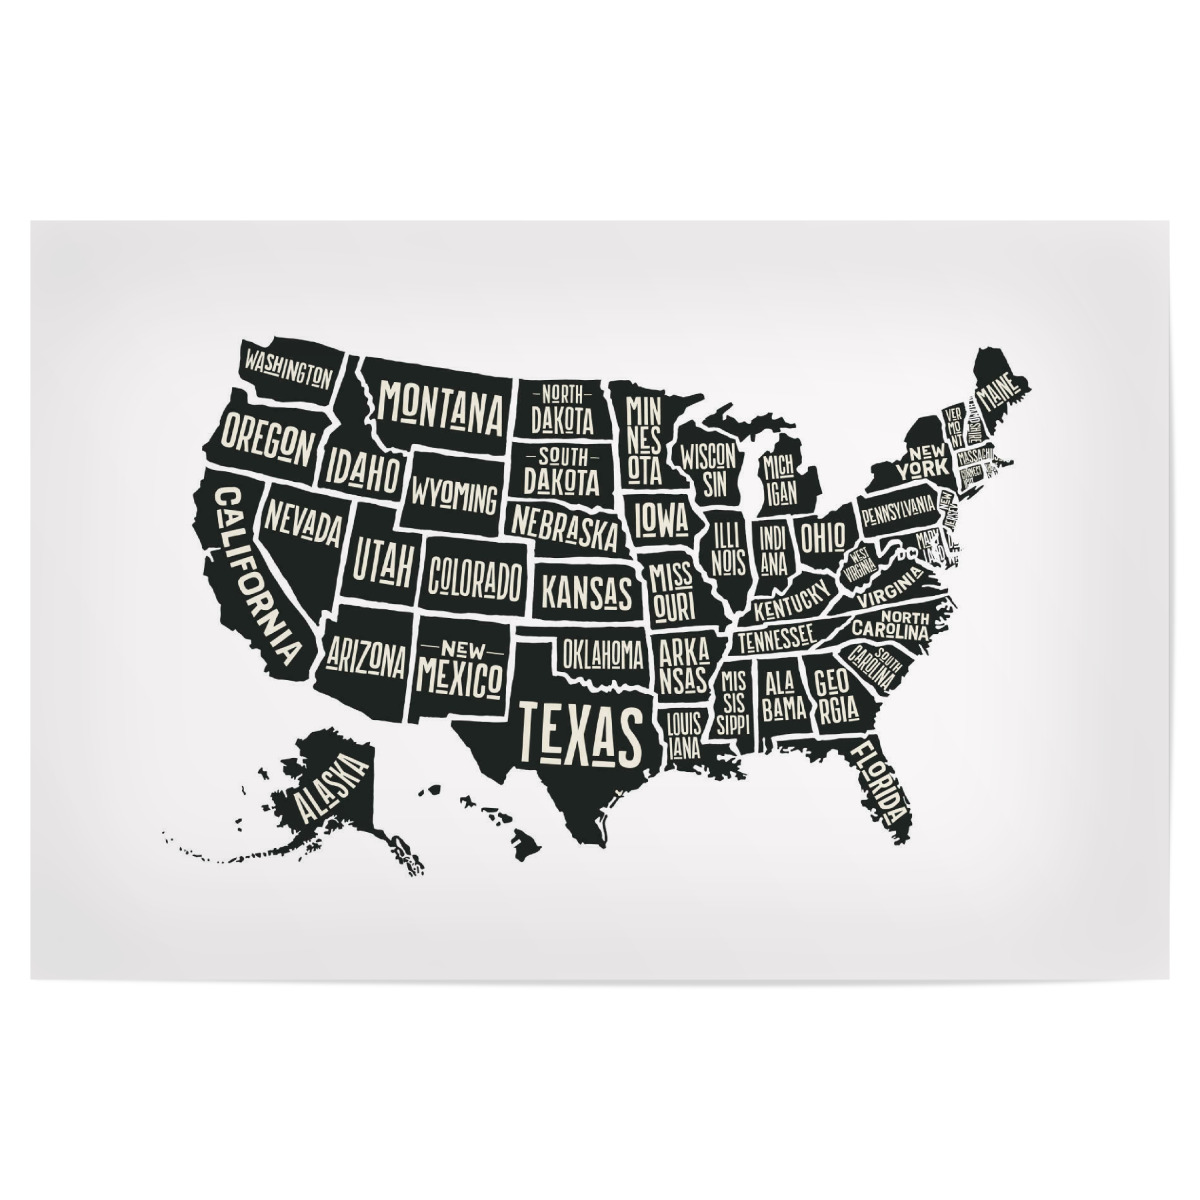 USA Map als Poster bei artboxONE kaufen